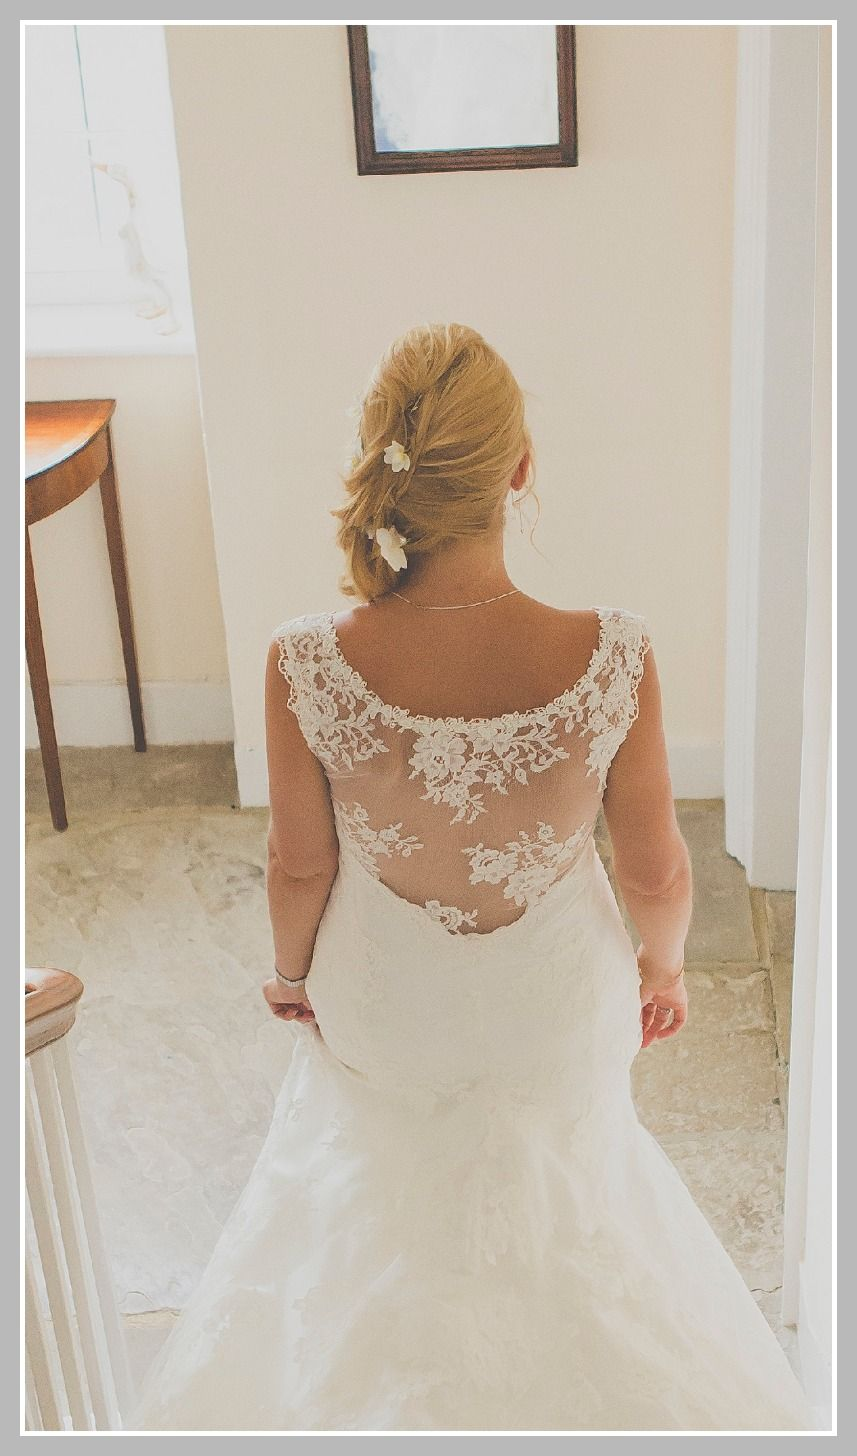 Lace back fishtail skirt. Lace wedding dress. Dana Bolton